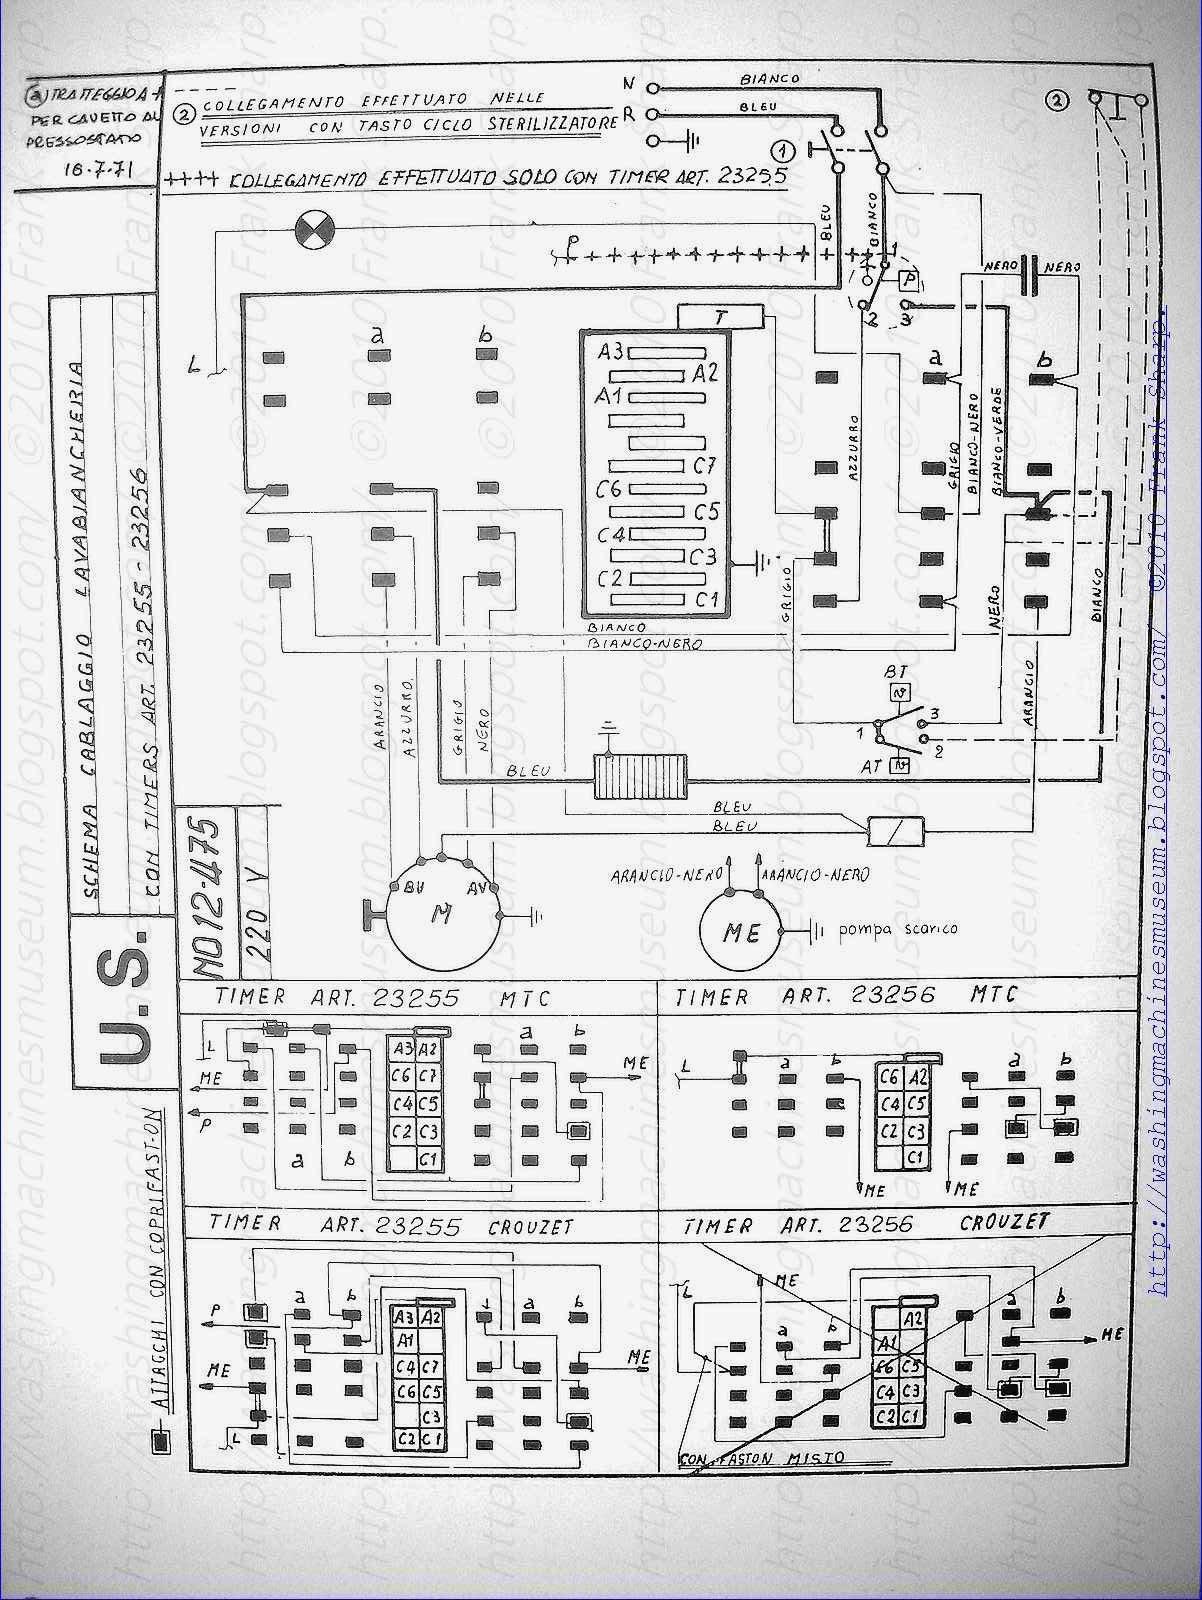 BO_4420] Wiring Diagram Of Videocon Washing Machine Download DiagramKicep Semec Brom Hutpa Dict Vira Mohammedshrine Librar Wiring 101